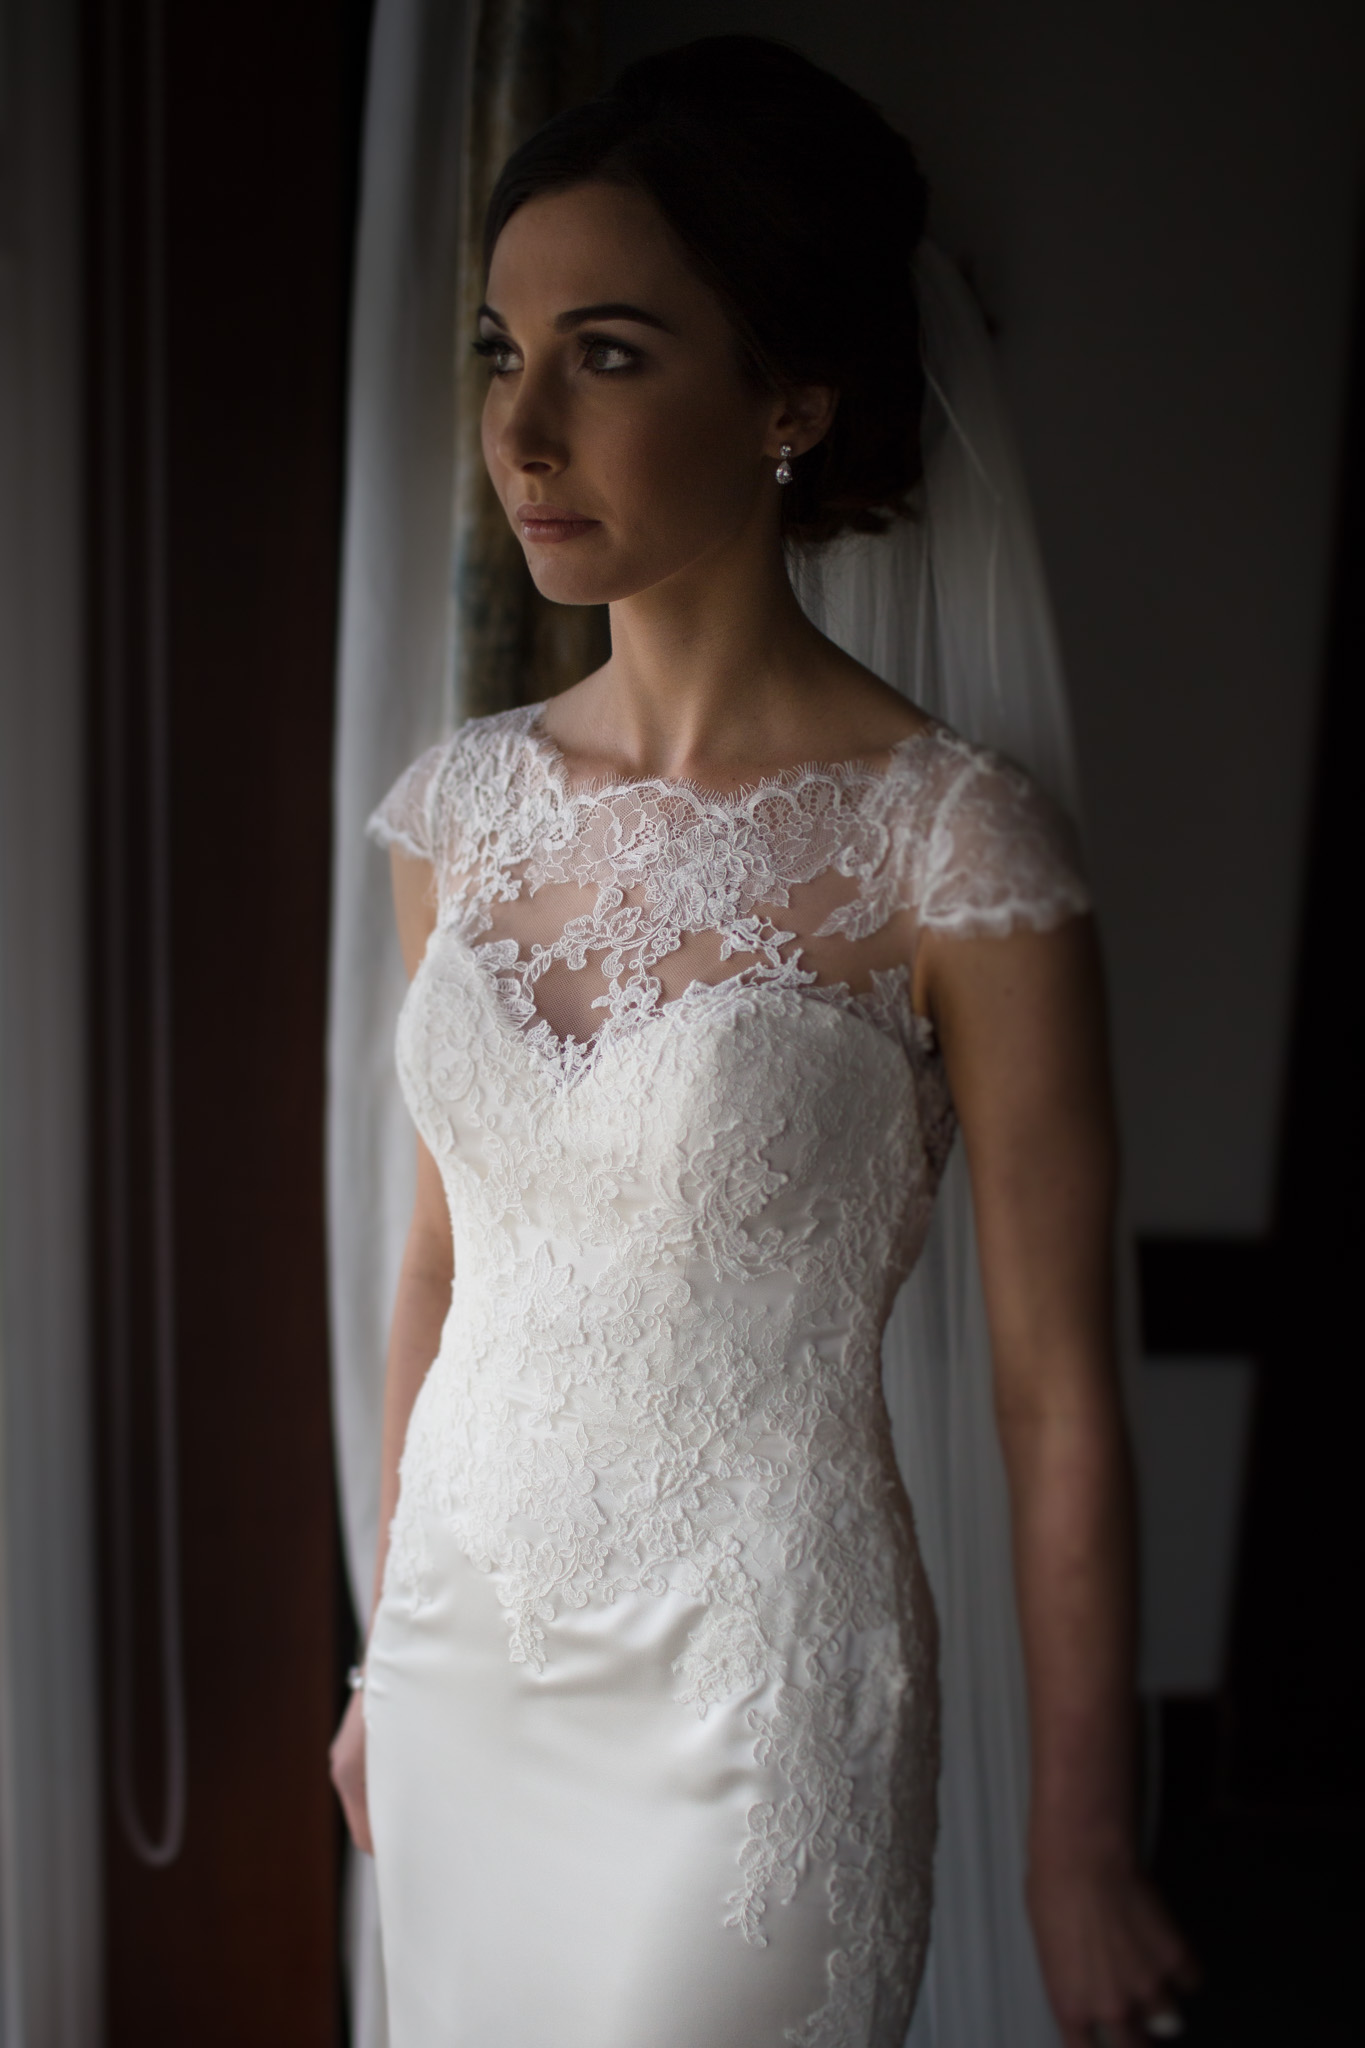 Mark_Barnes_Northern_Ireland_Wedding_Photography_Leighinmohr-house-hotel-ballymena_Wedding_Photography-12.jpg